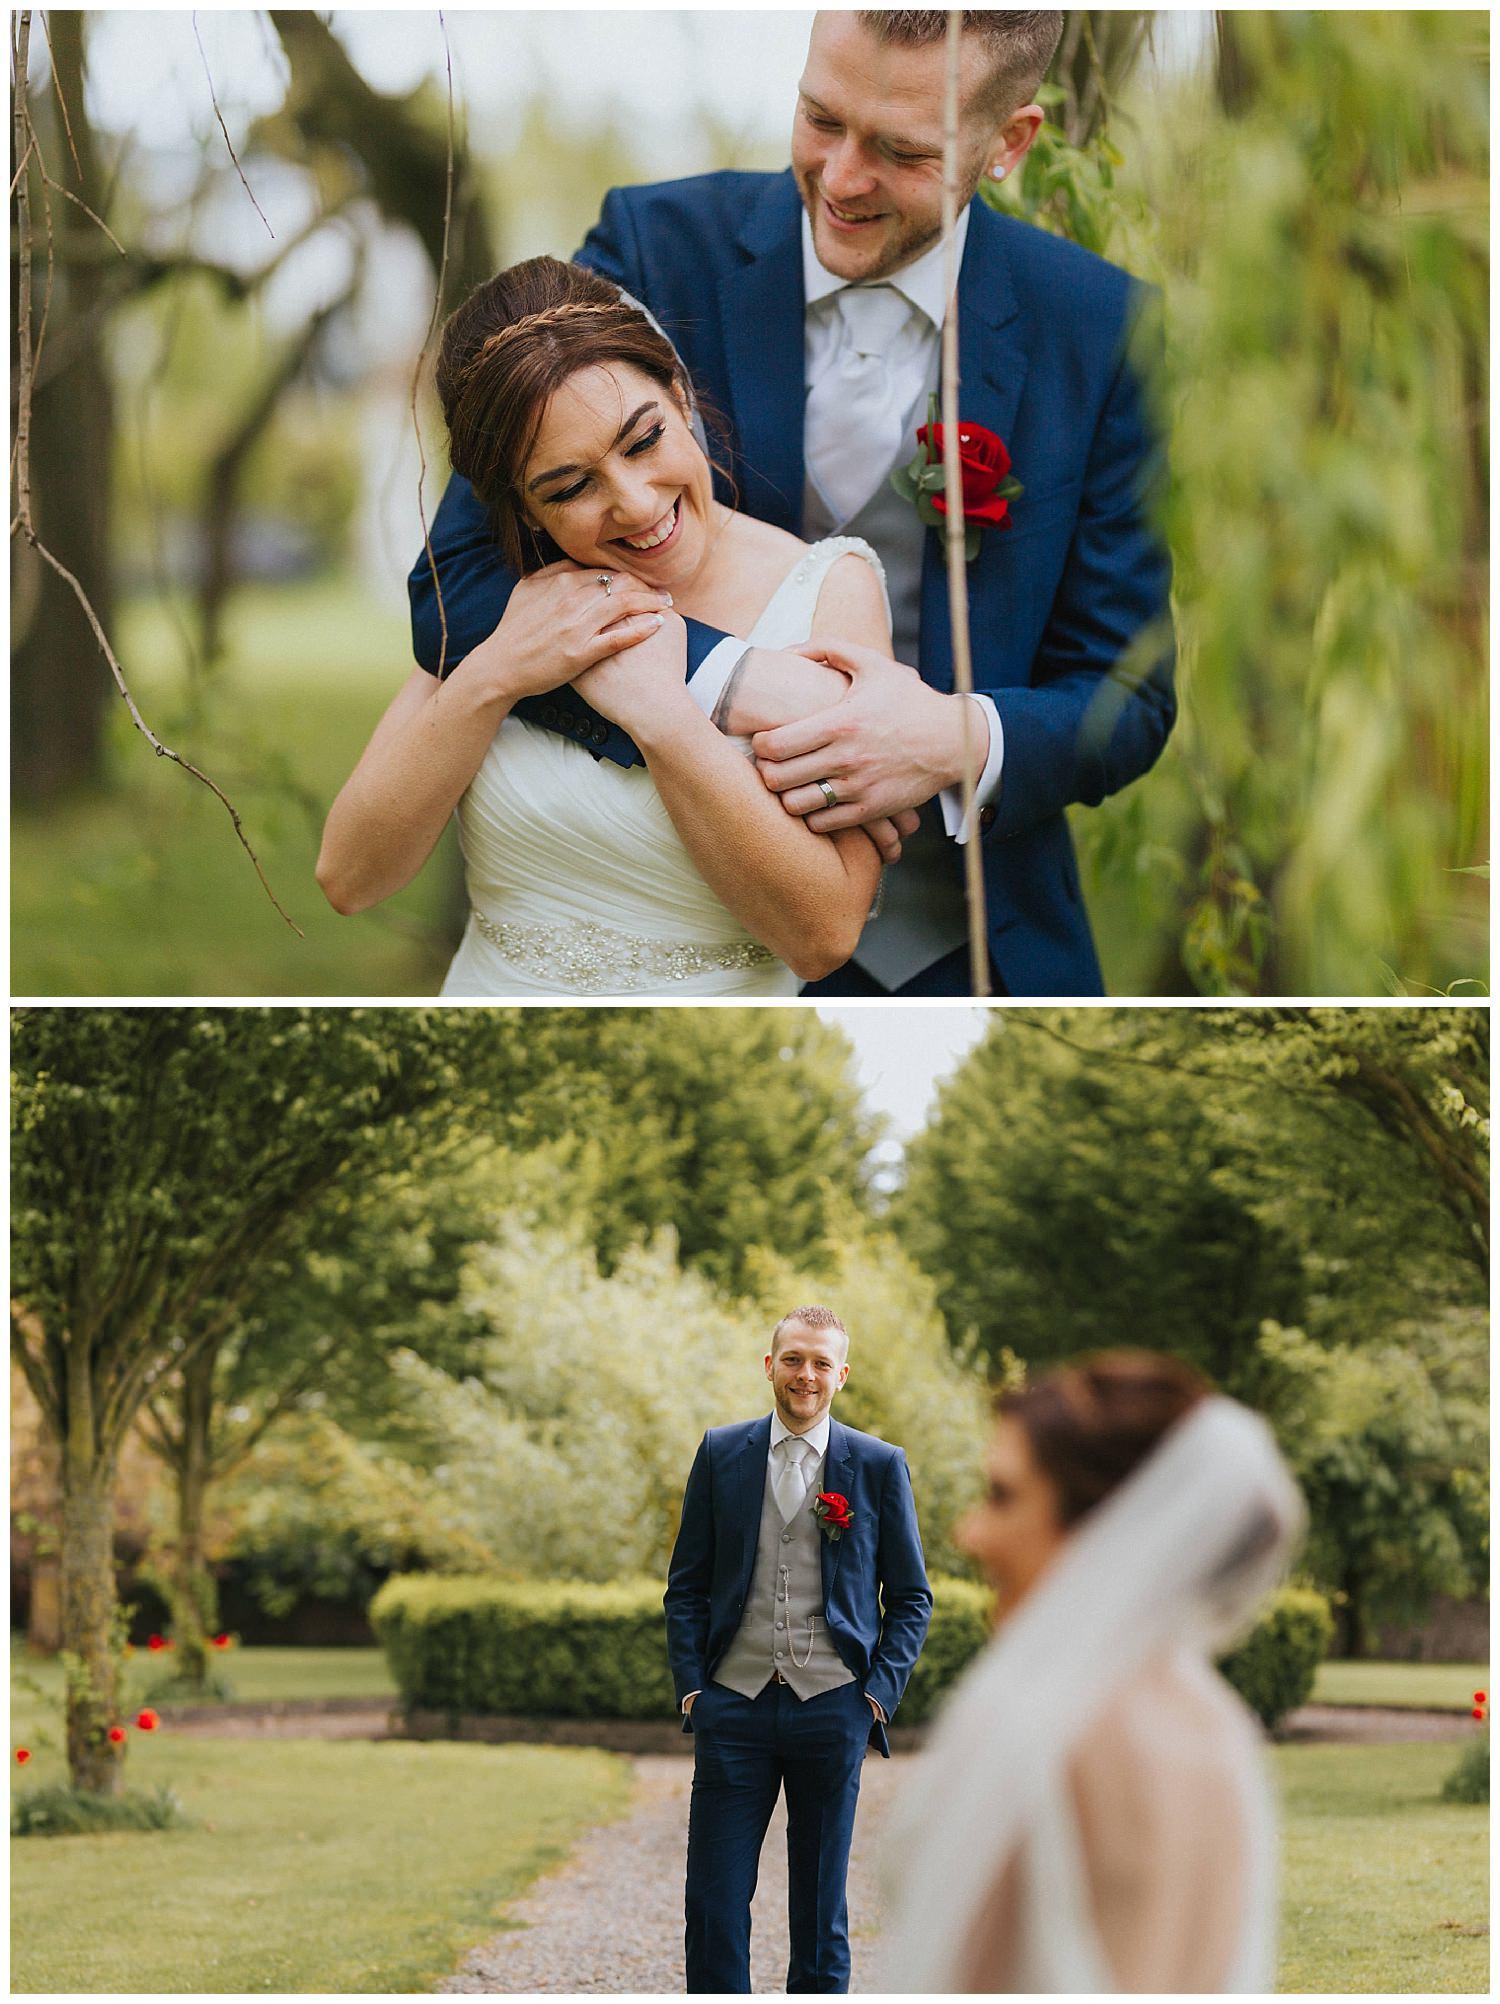 barberstown_castle_wedding_photographer_2017_22.jpg